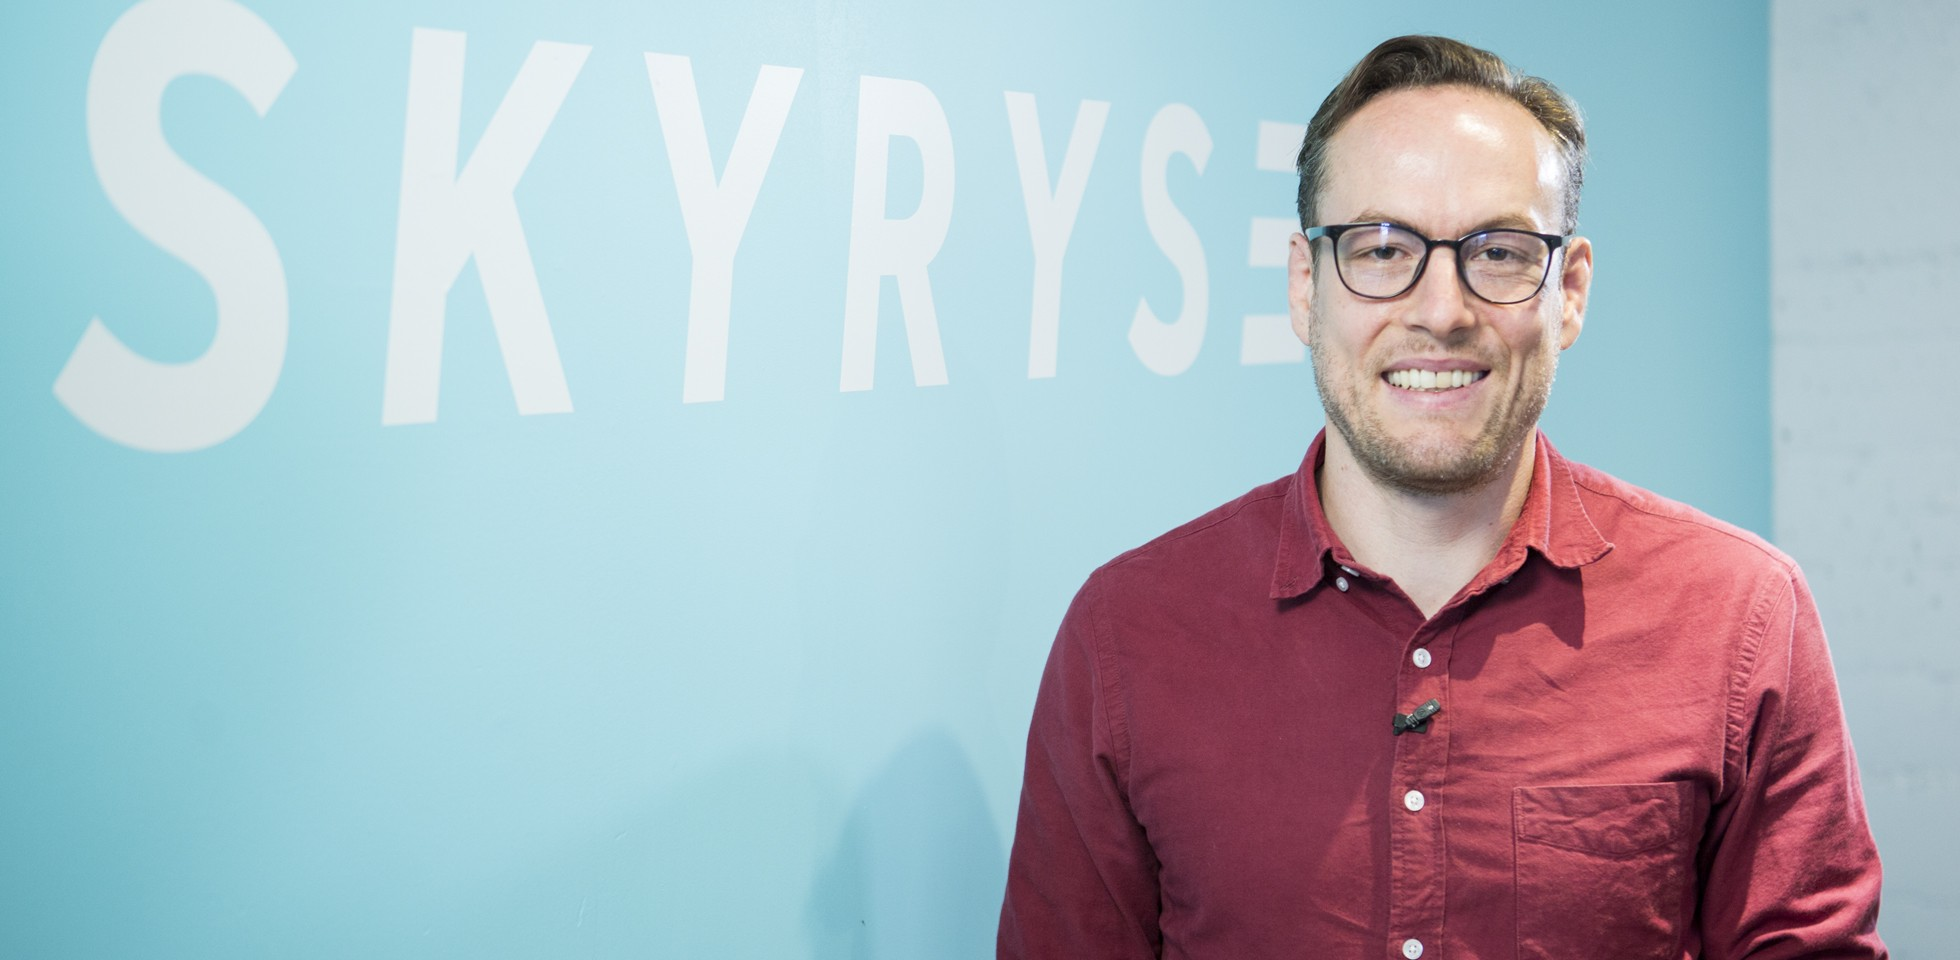 Jon Reeves, Embedded Systems Lead - SkyRyse Careers